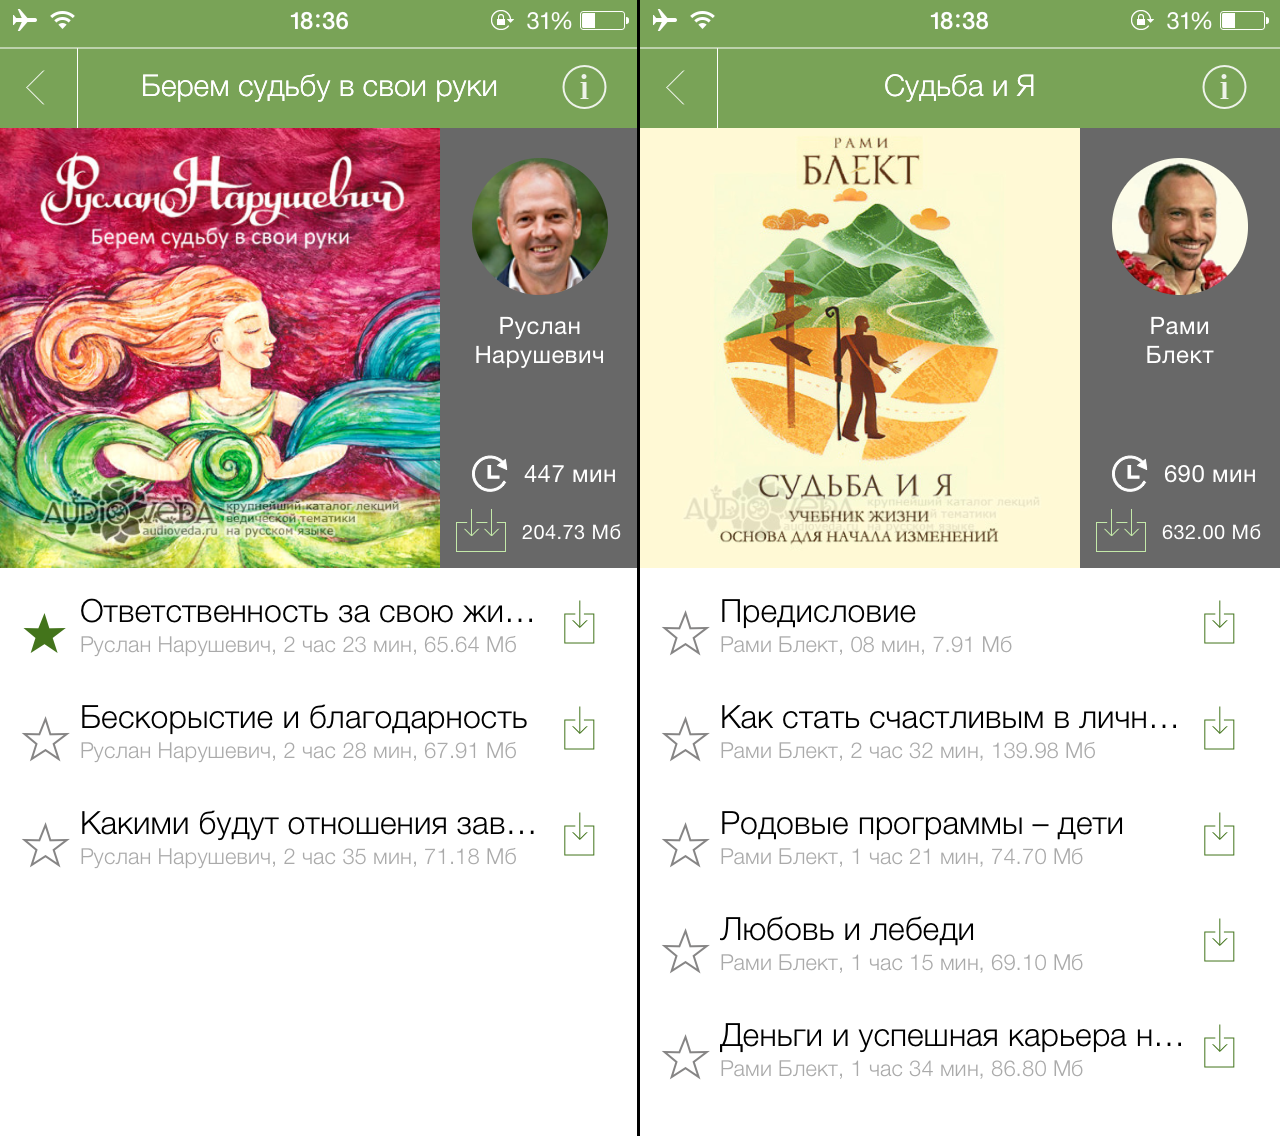 audioveda-app-v1.05-cyle